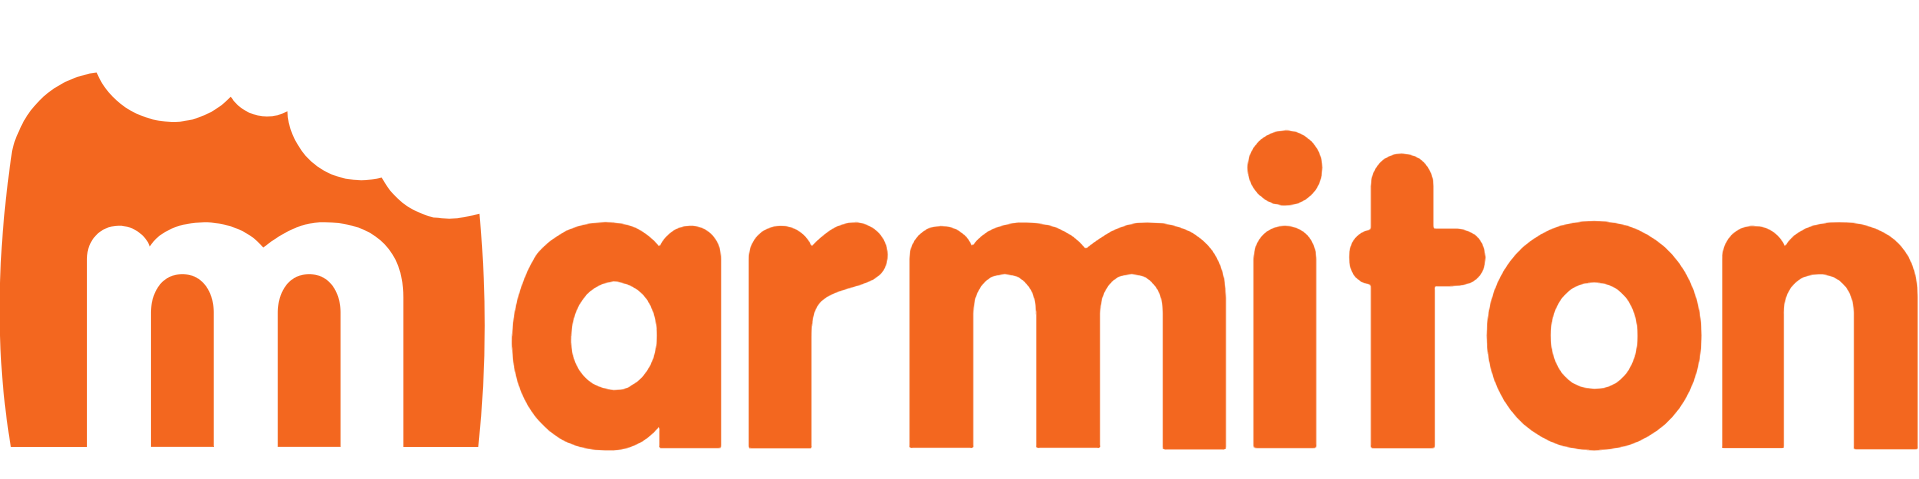 Logo du magazine Marmiton